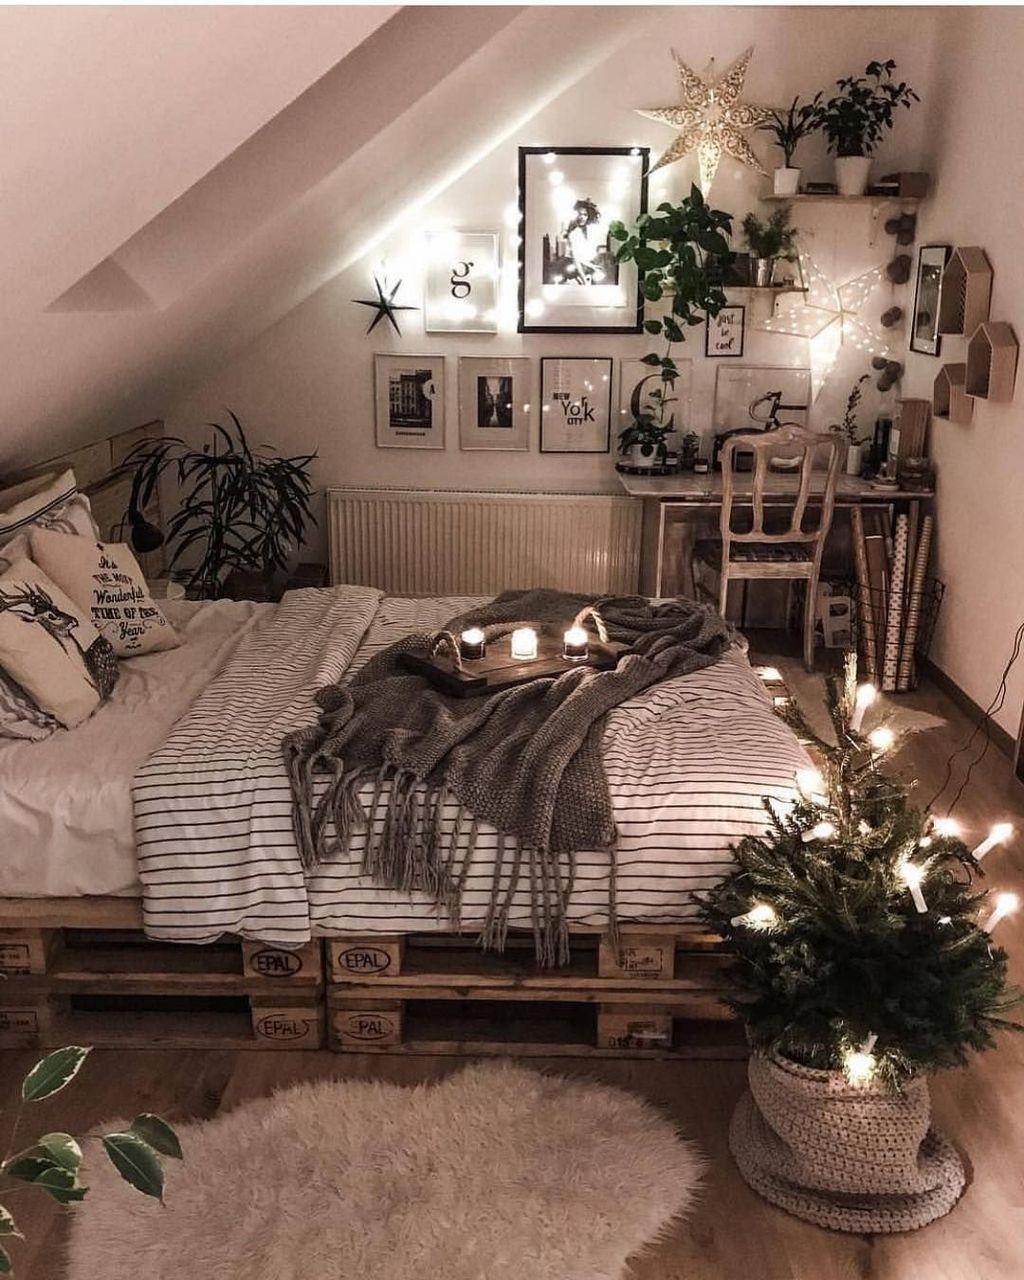 Fabulous Vintage Bedroom Decor Ideas Bedroom Design Small Bedroom Small Bedroom Decor